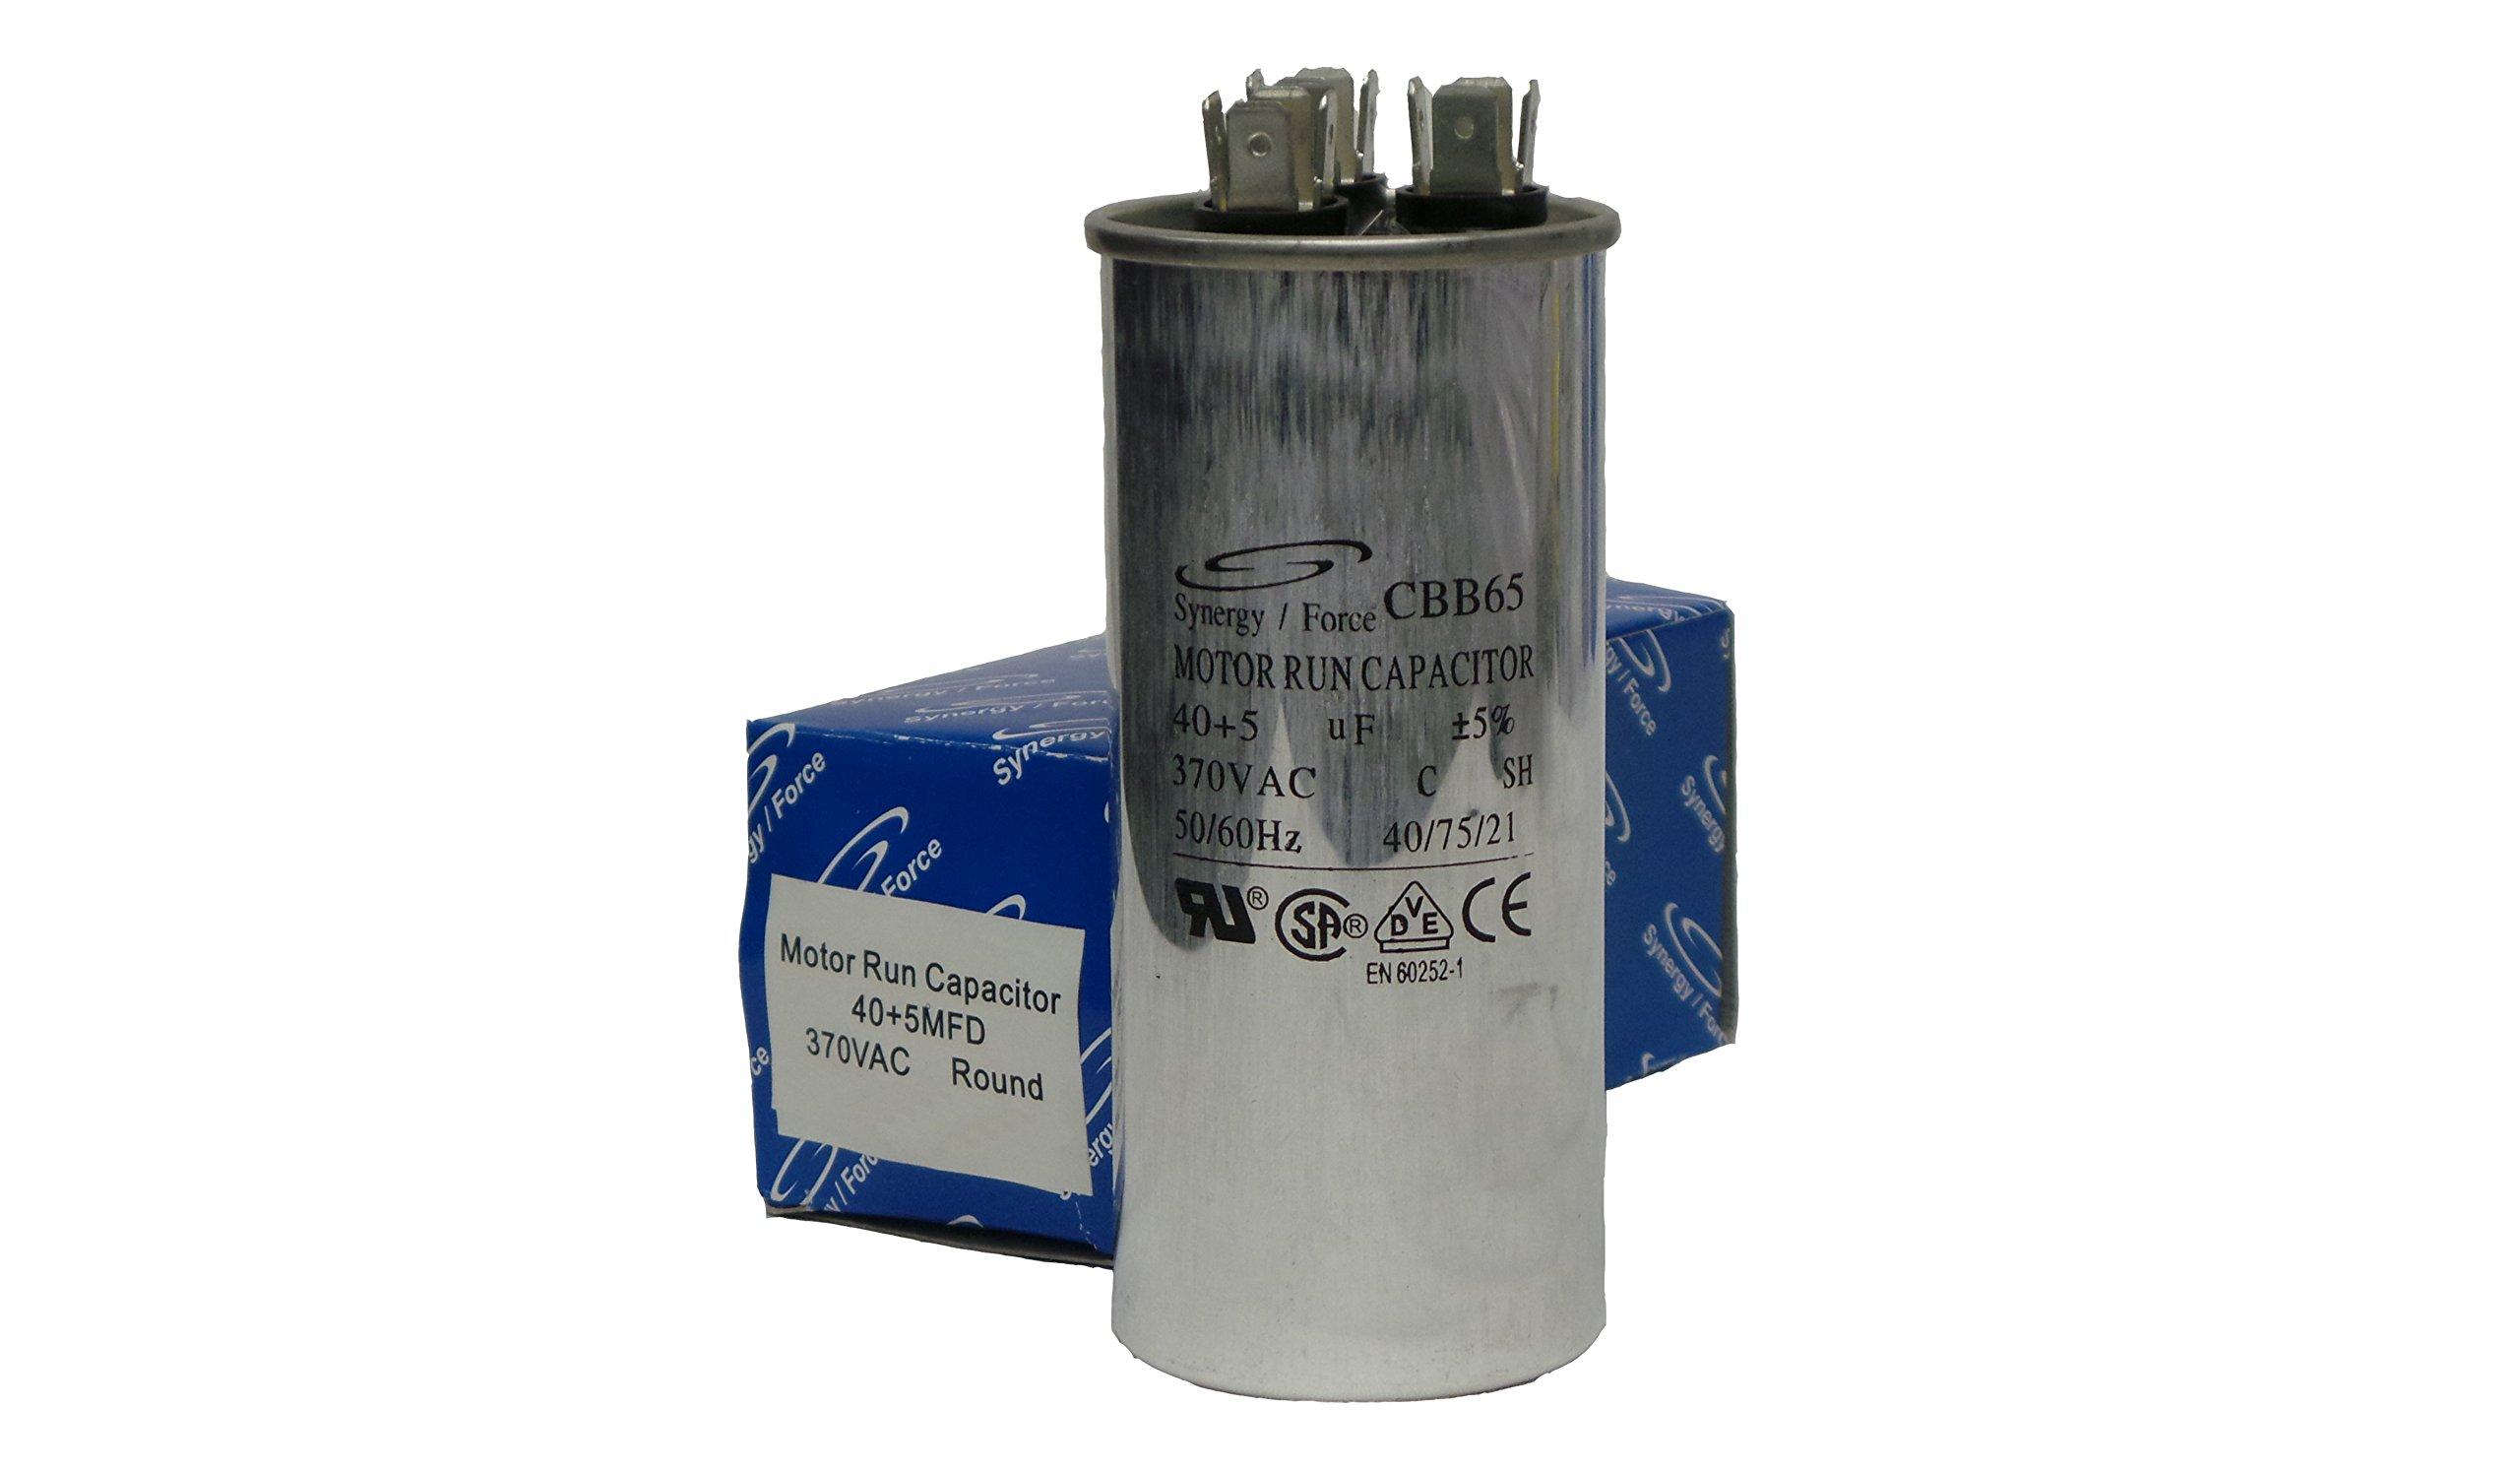 CBB65 Motor Run Capacitor, 40+5 uF +5%, 370VAC, 50/60Hz, 40/75/21, RU CSA VDE CE Certified